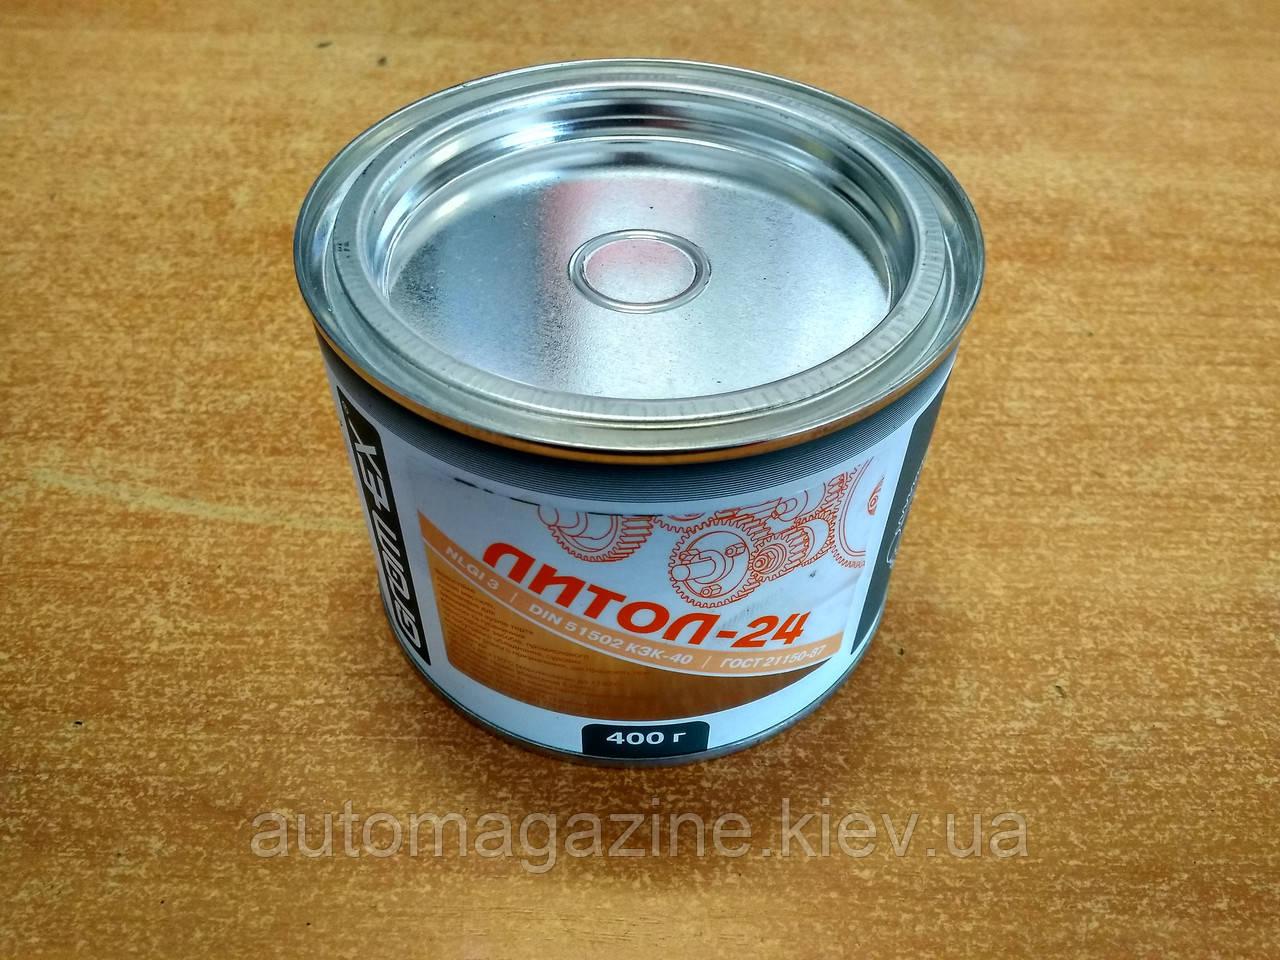 Смазка Литол-24 (400г)